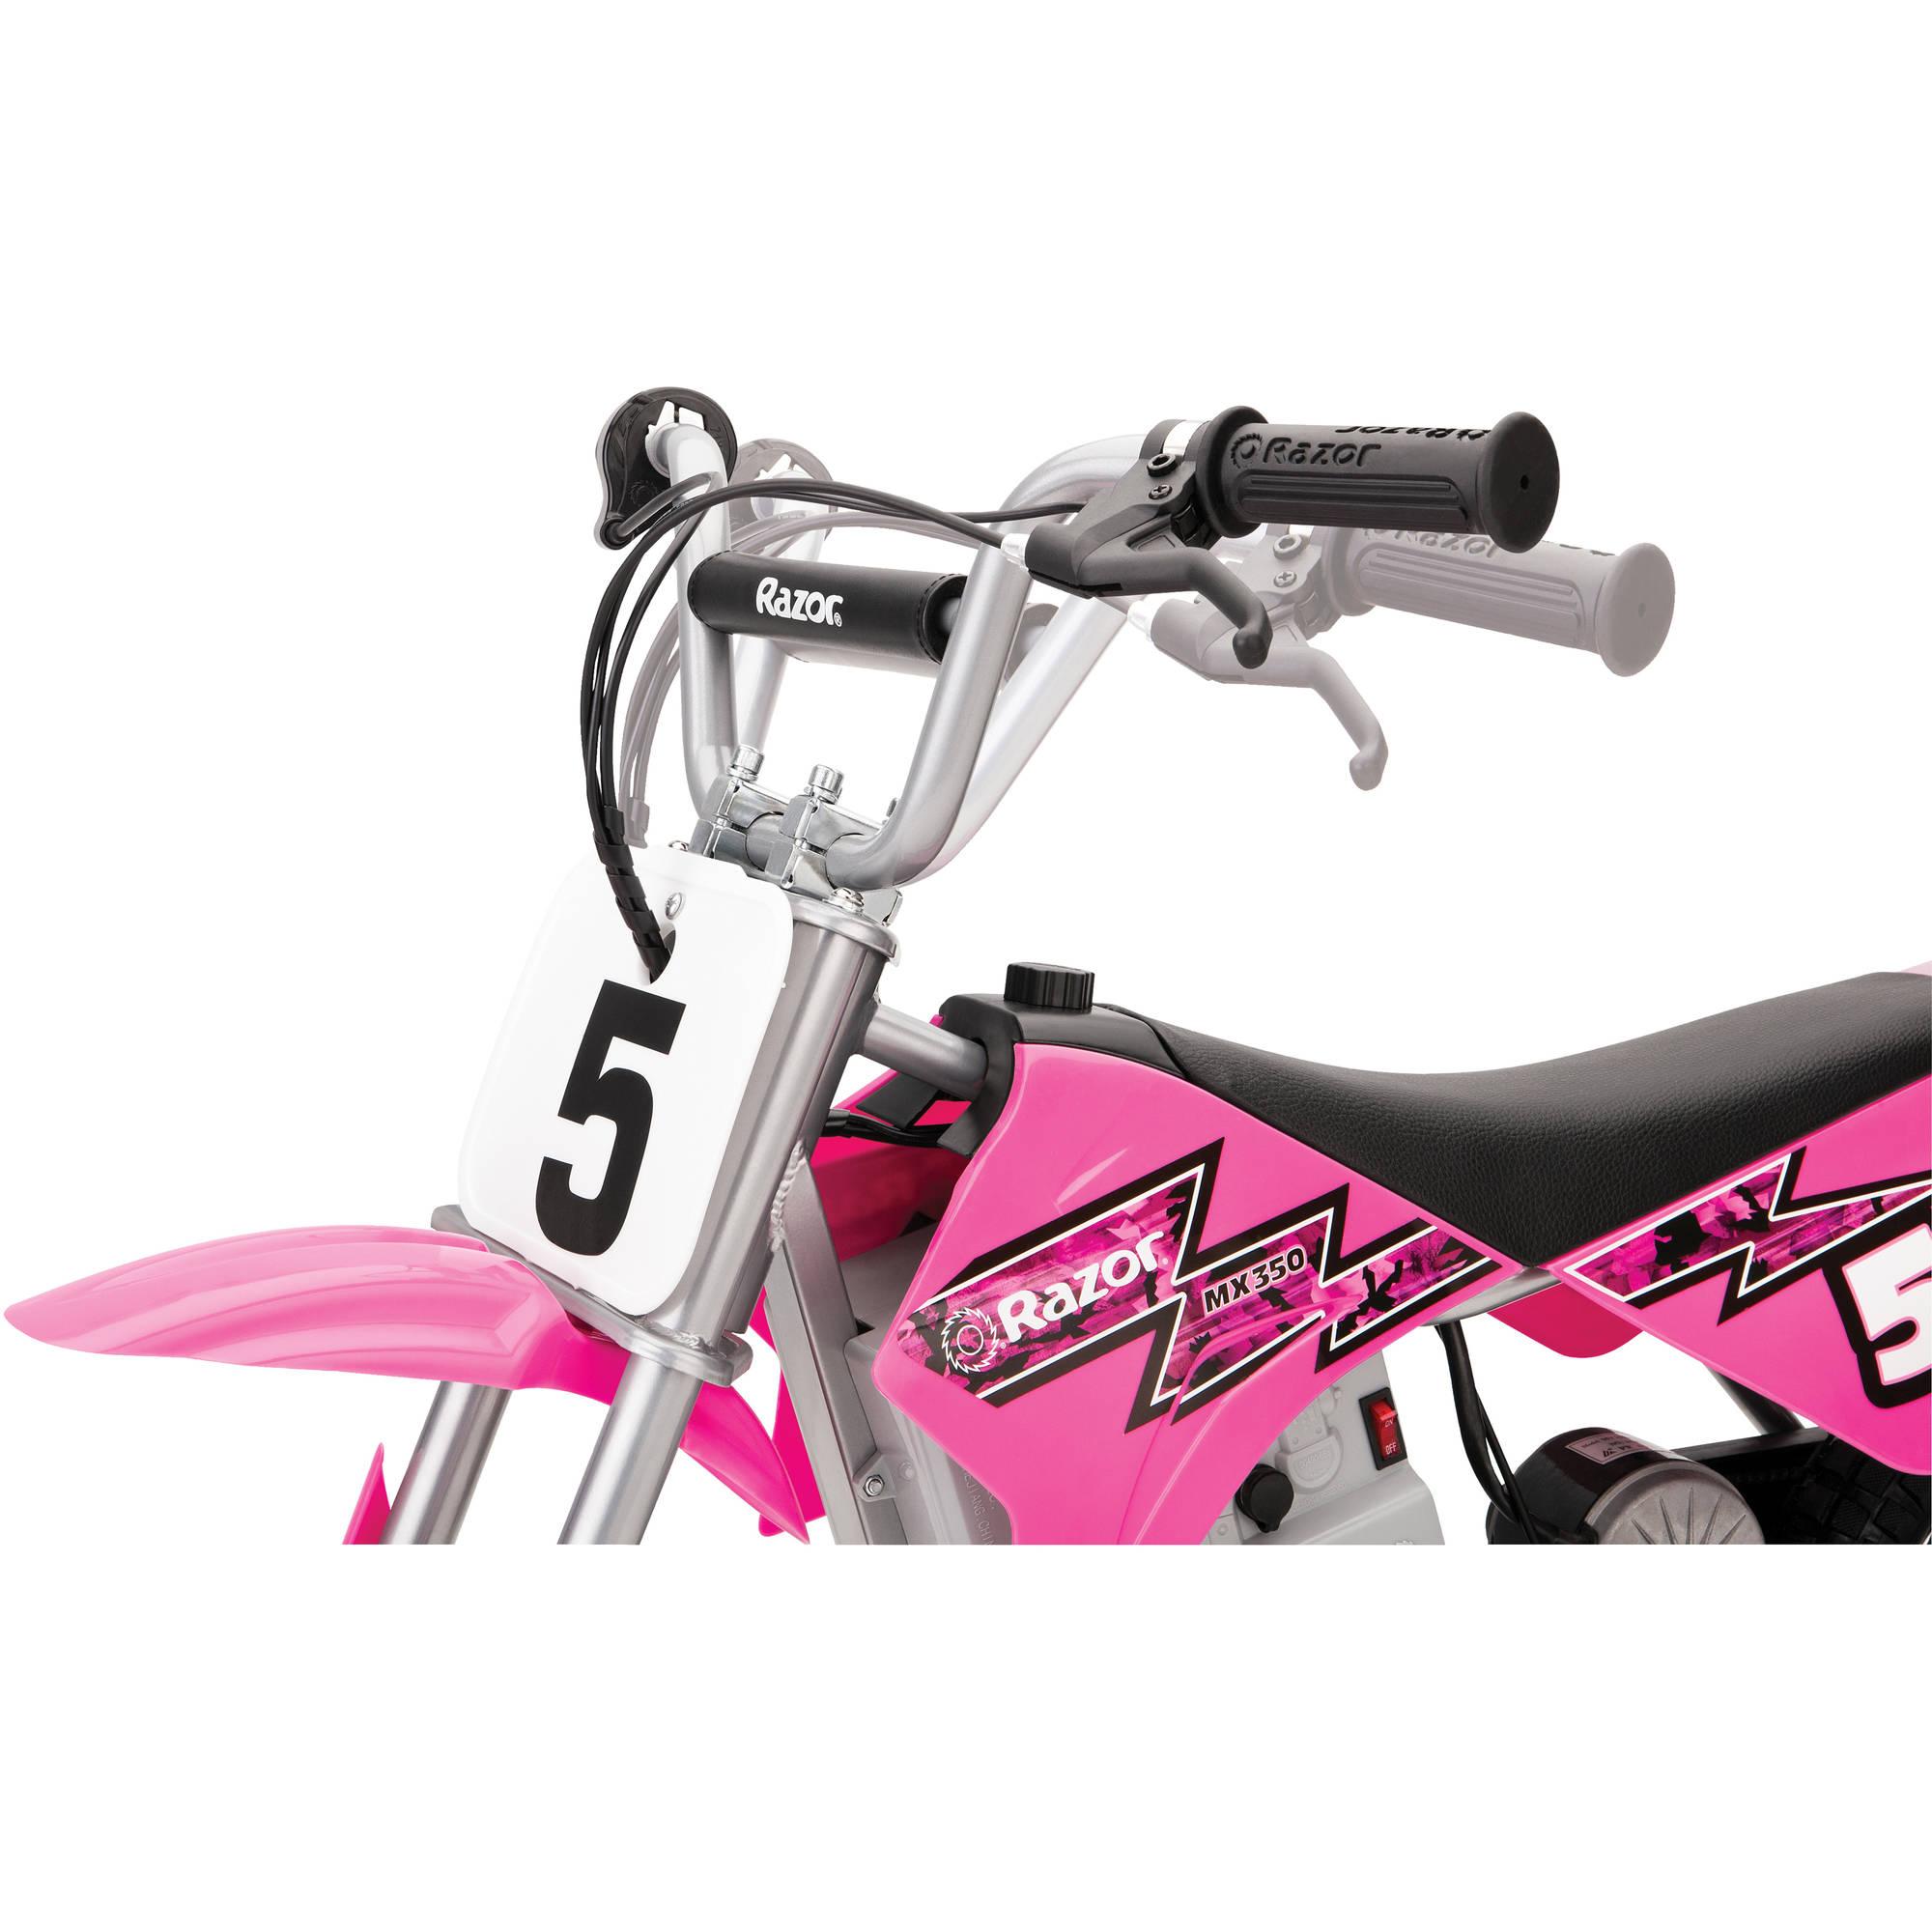 hight resolution of dirt bike razor mx350 battery wiring diagram